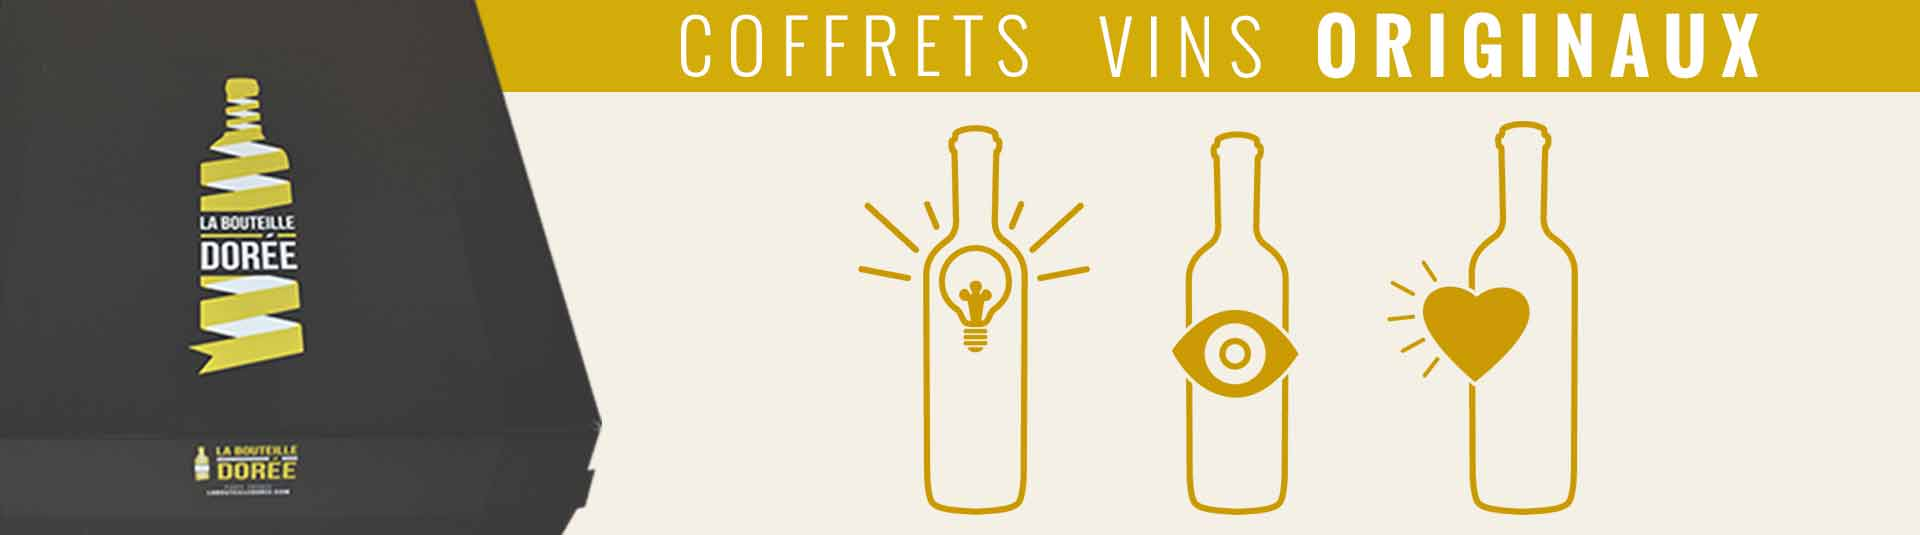 Coffret vin original